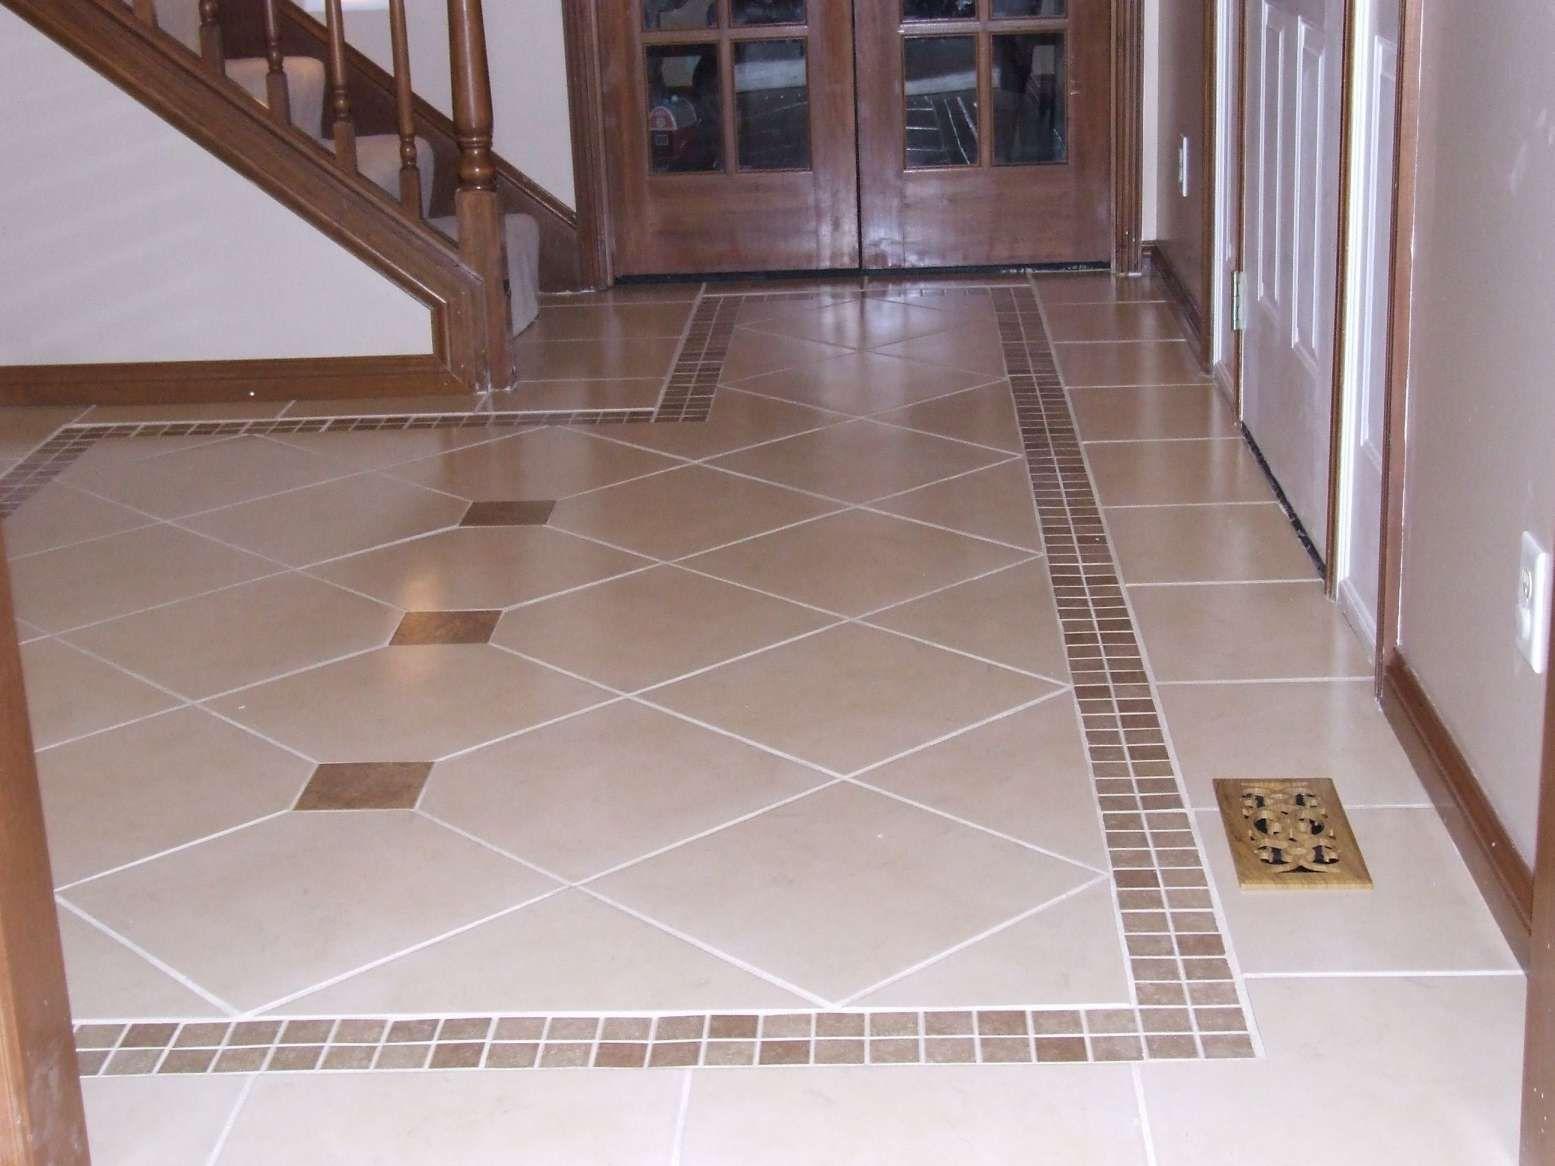 10 Impressive Decorative Ceramic Tile Borders Collection In 2020 Patterned Floor Tiles Floor Tile Design Tile Floor